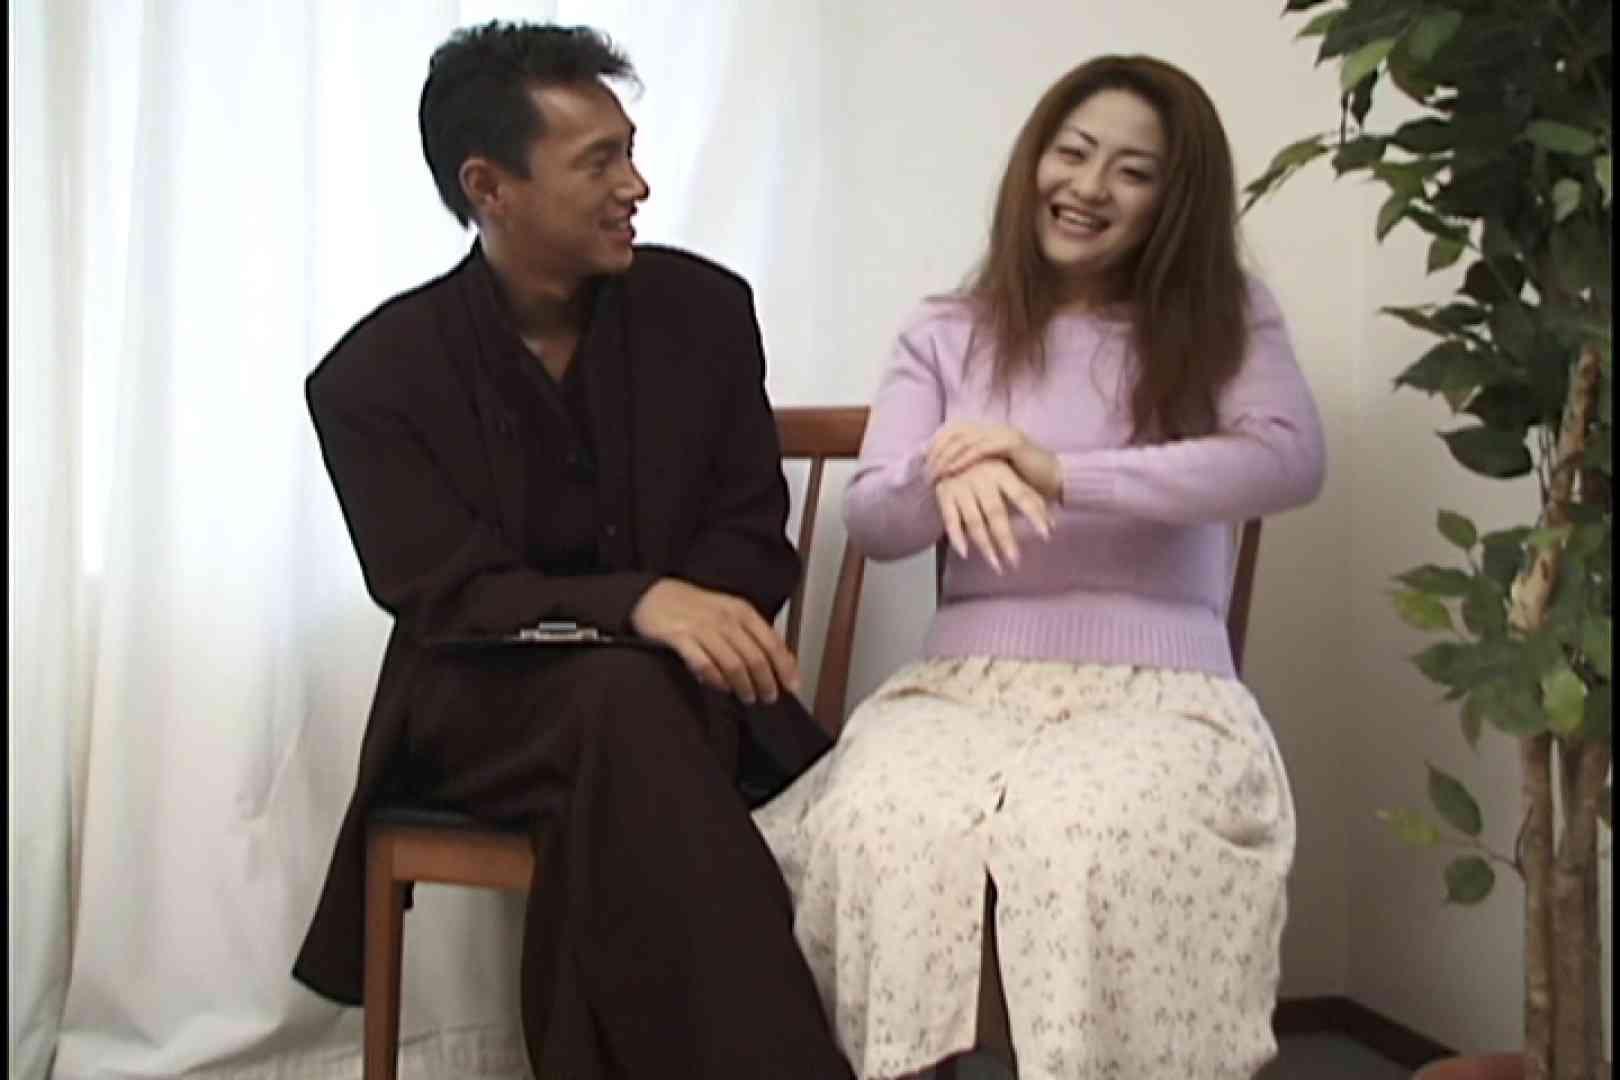 昼間の奥様は欲求不満 ~青井祐子~ 熟女  43連発 20